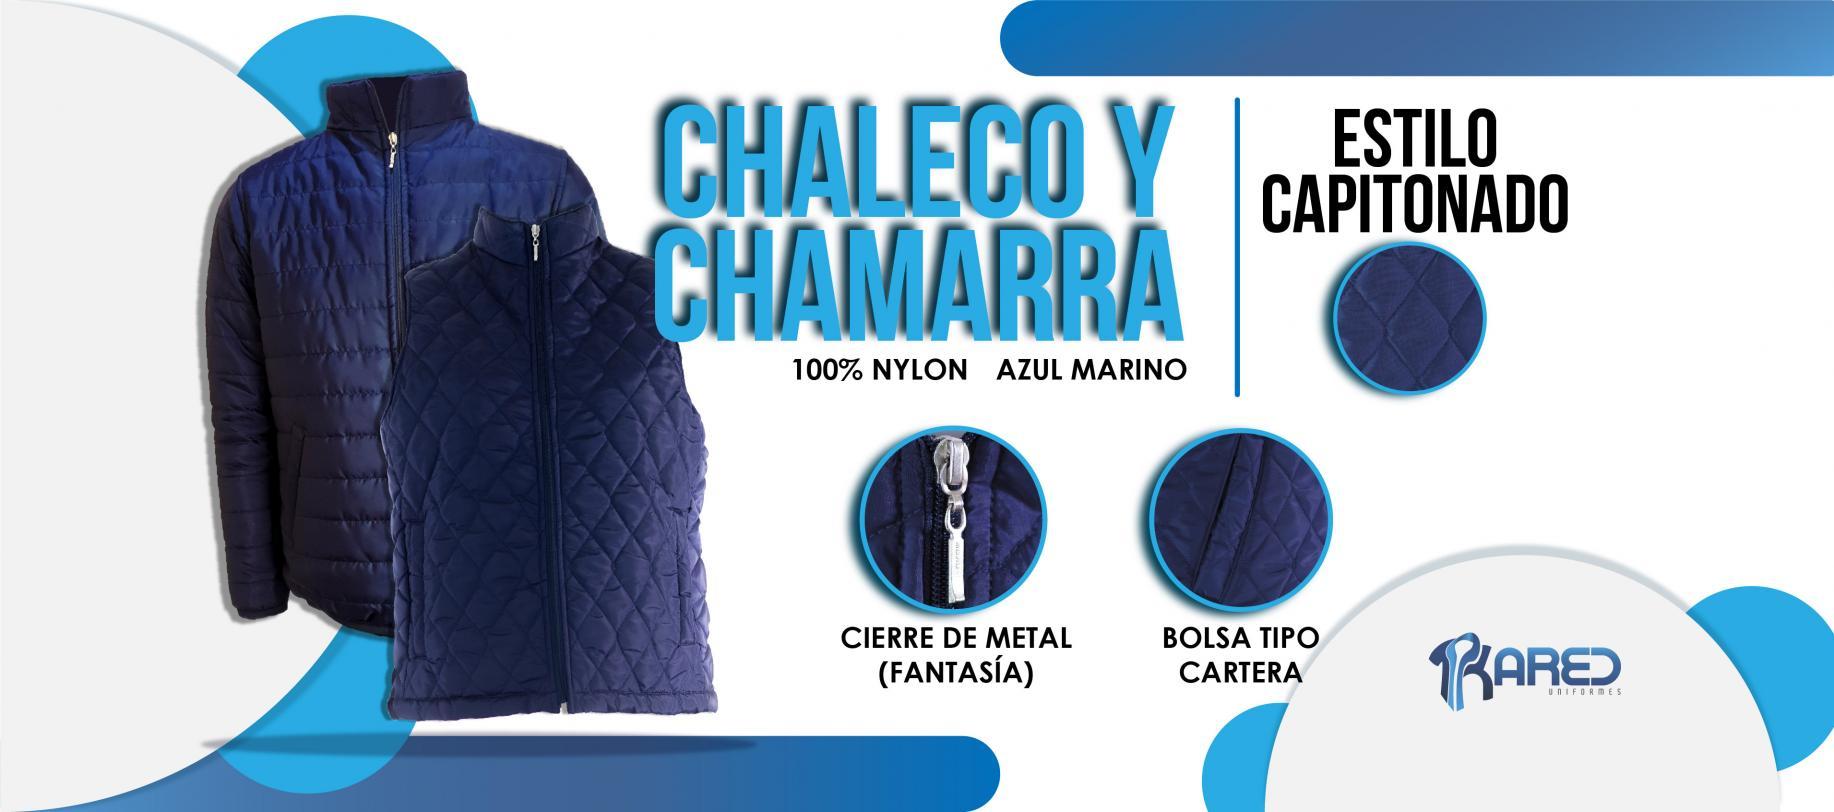 Chamarra / Chaleco